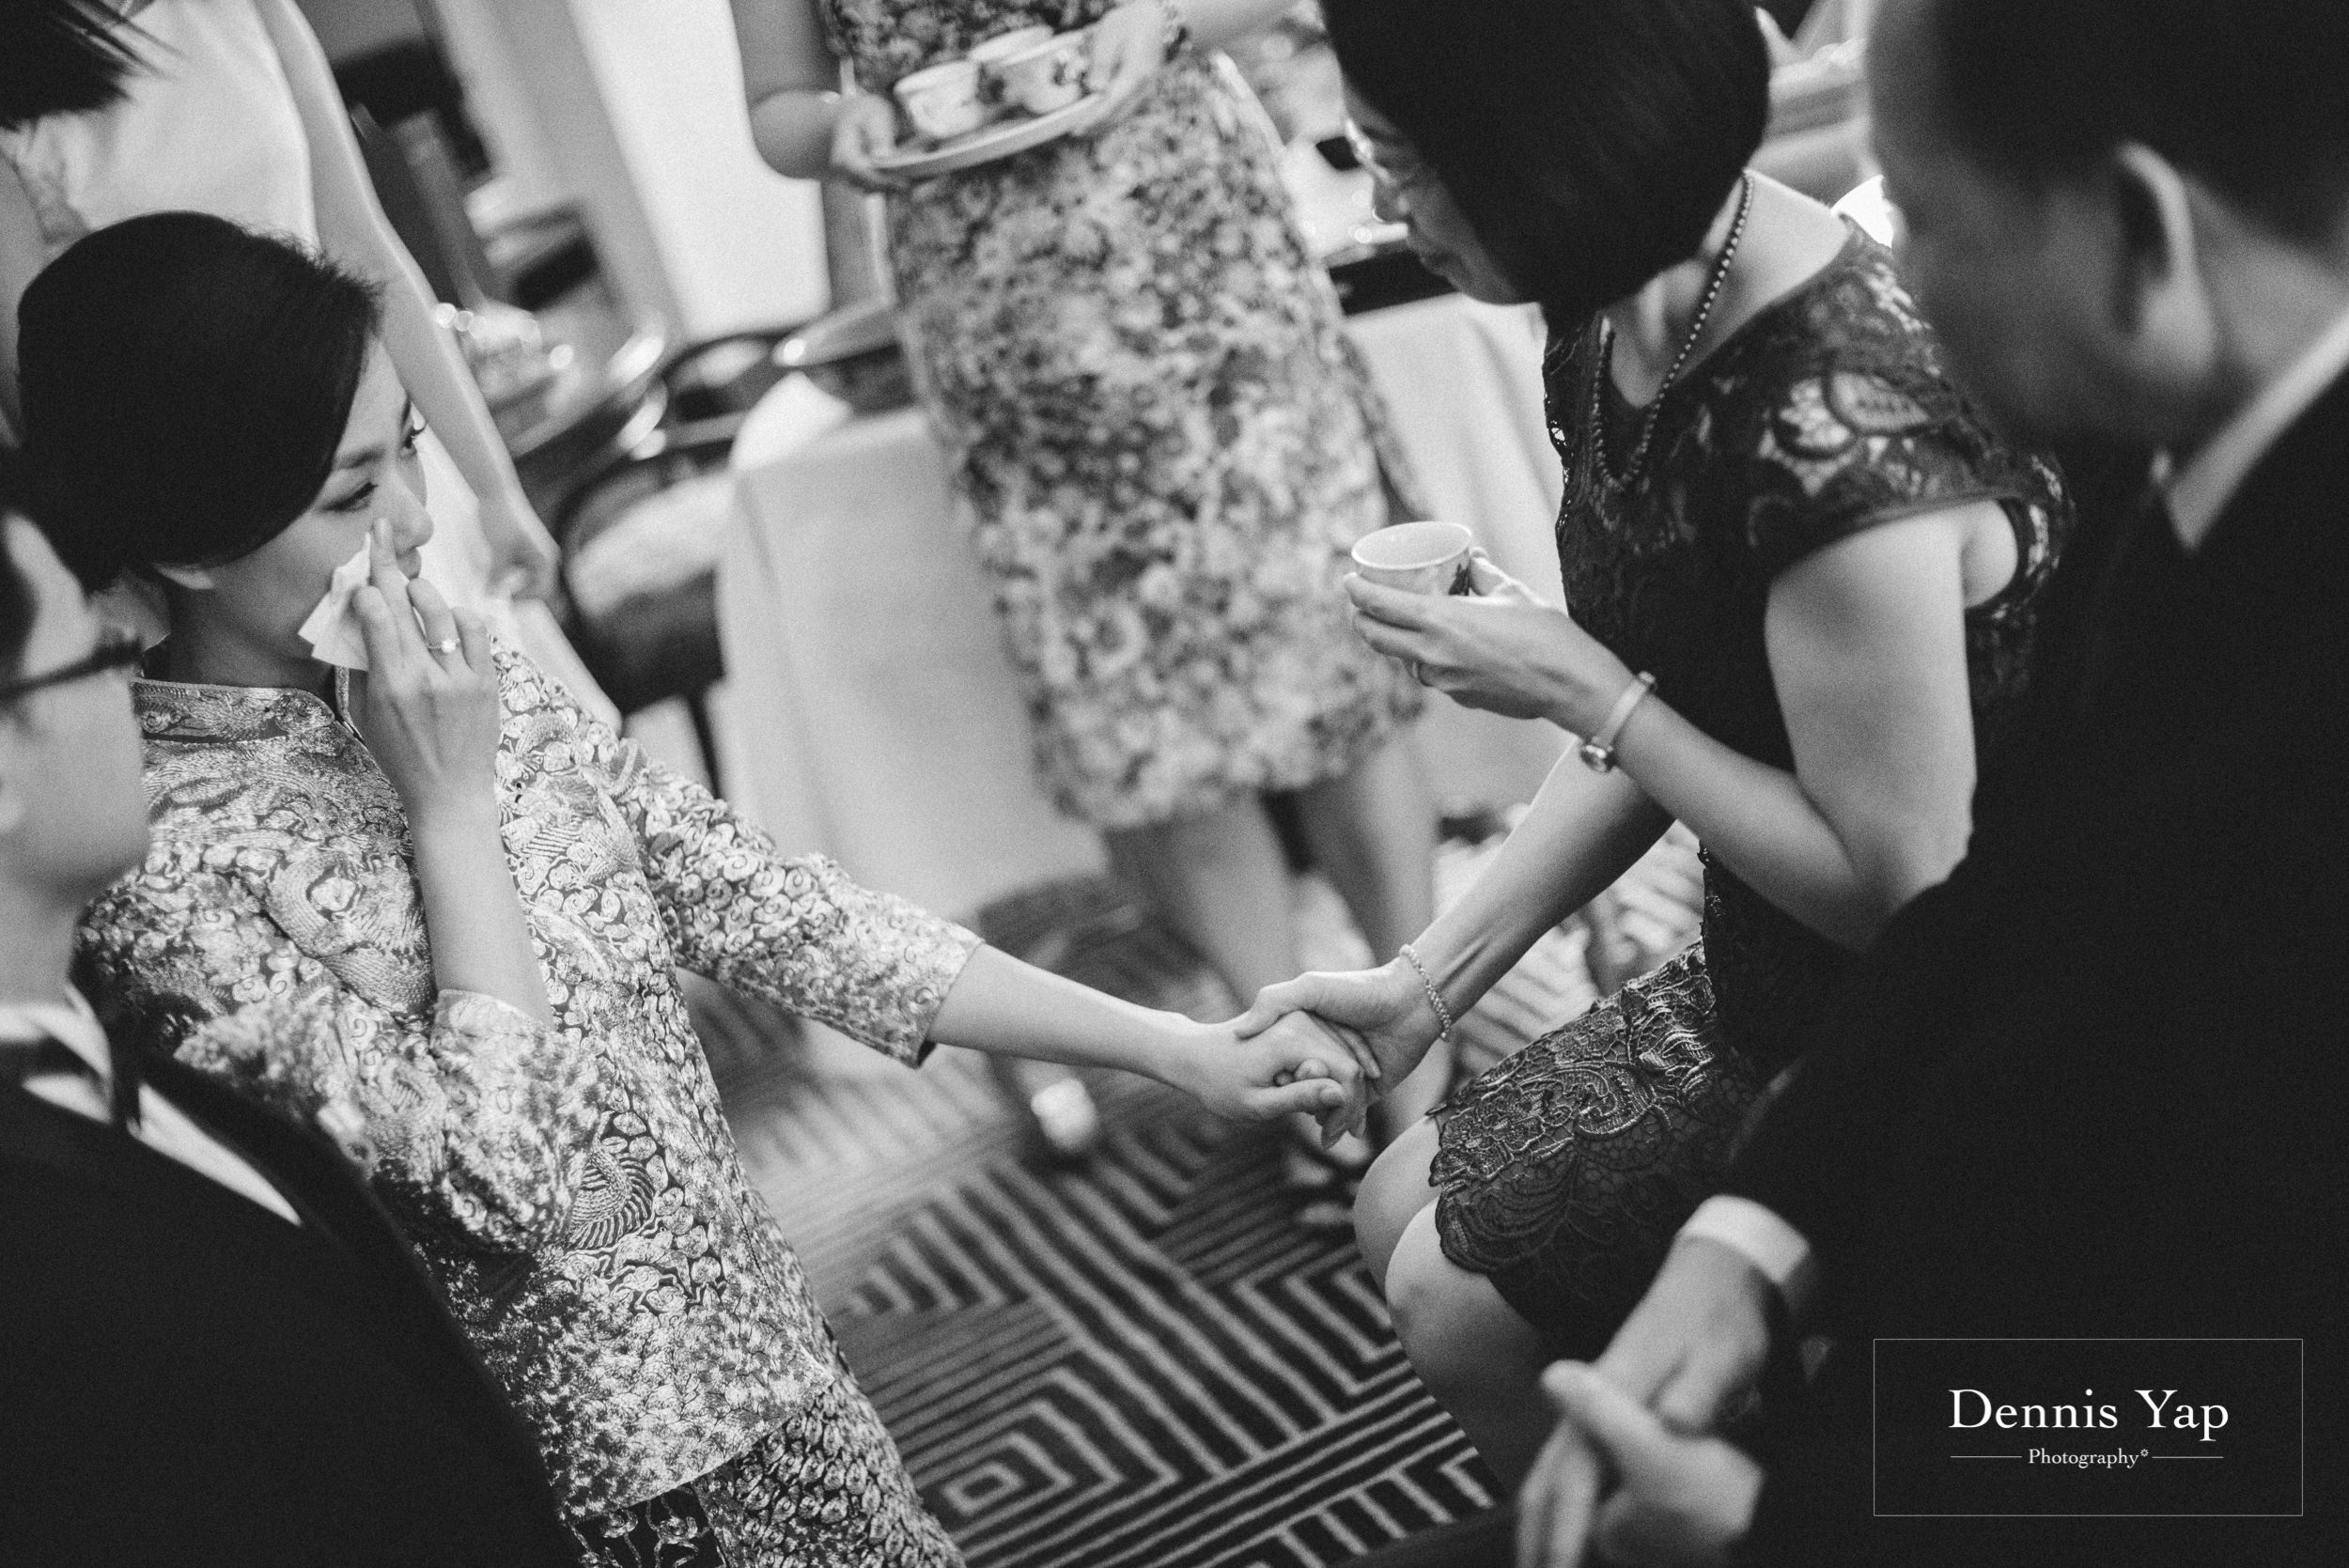 wai keong jenny wedding day bangsar dennis yap photography emotions beloved family-14.jpg